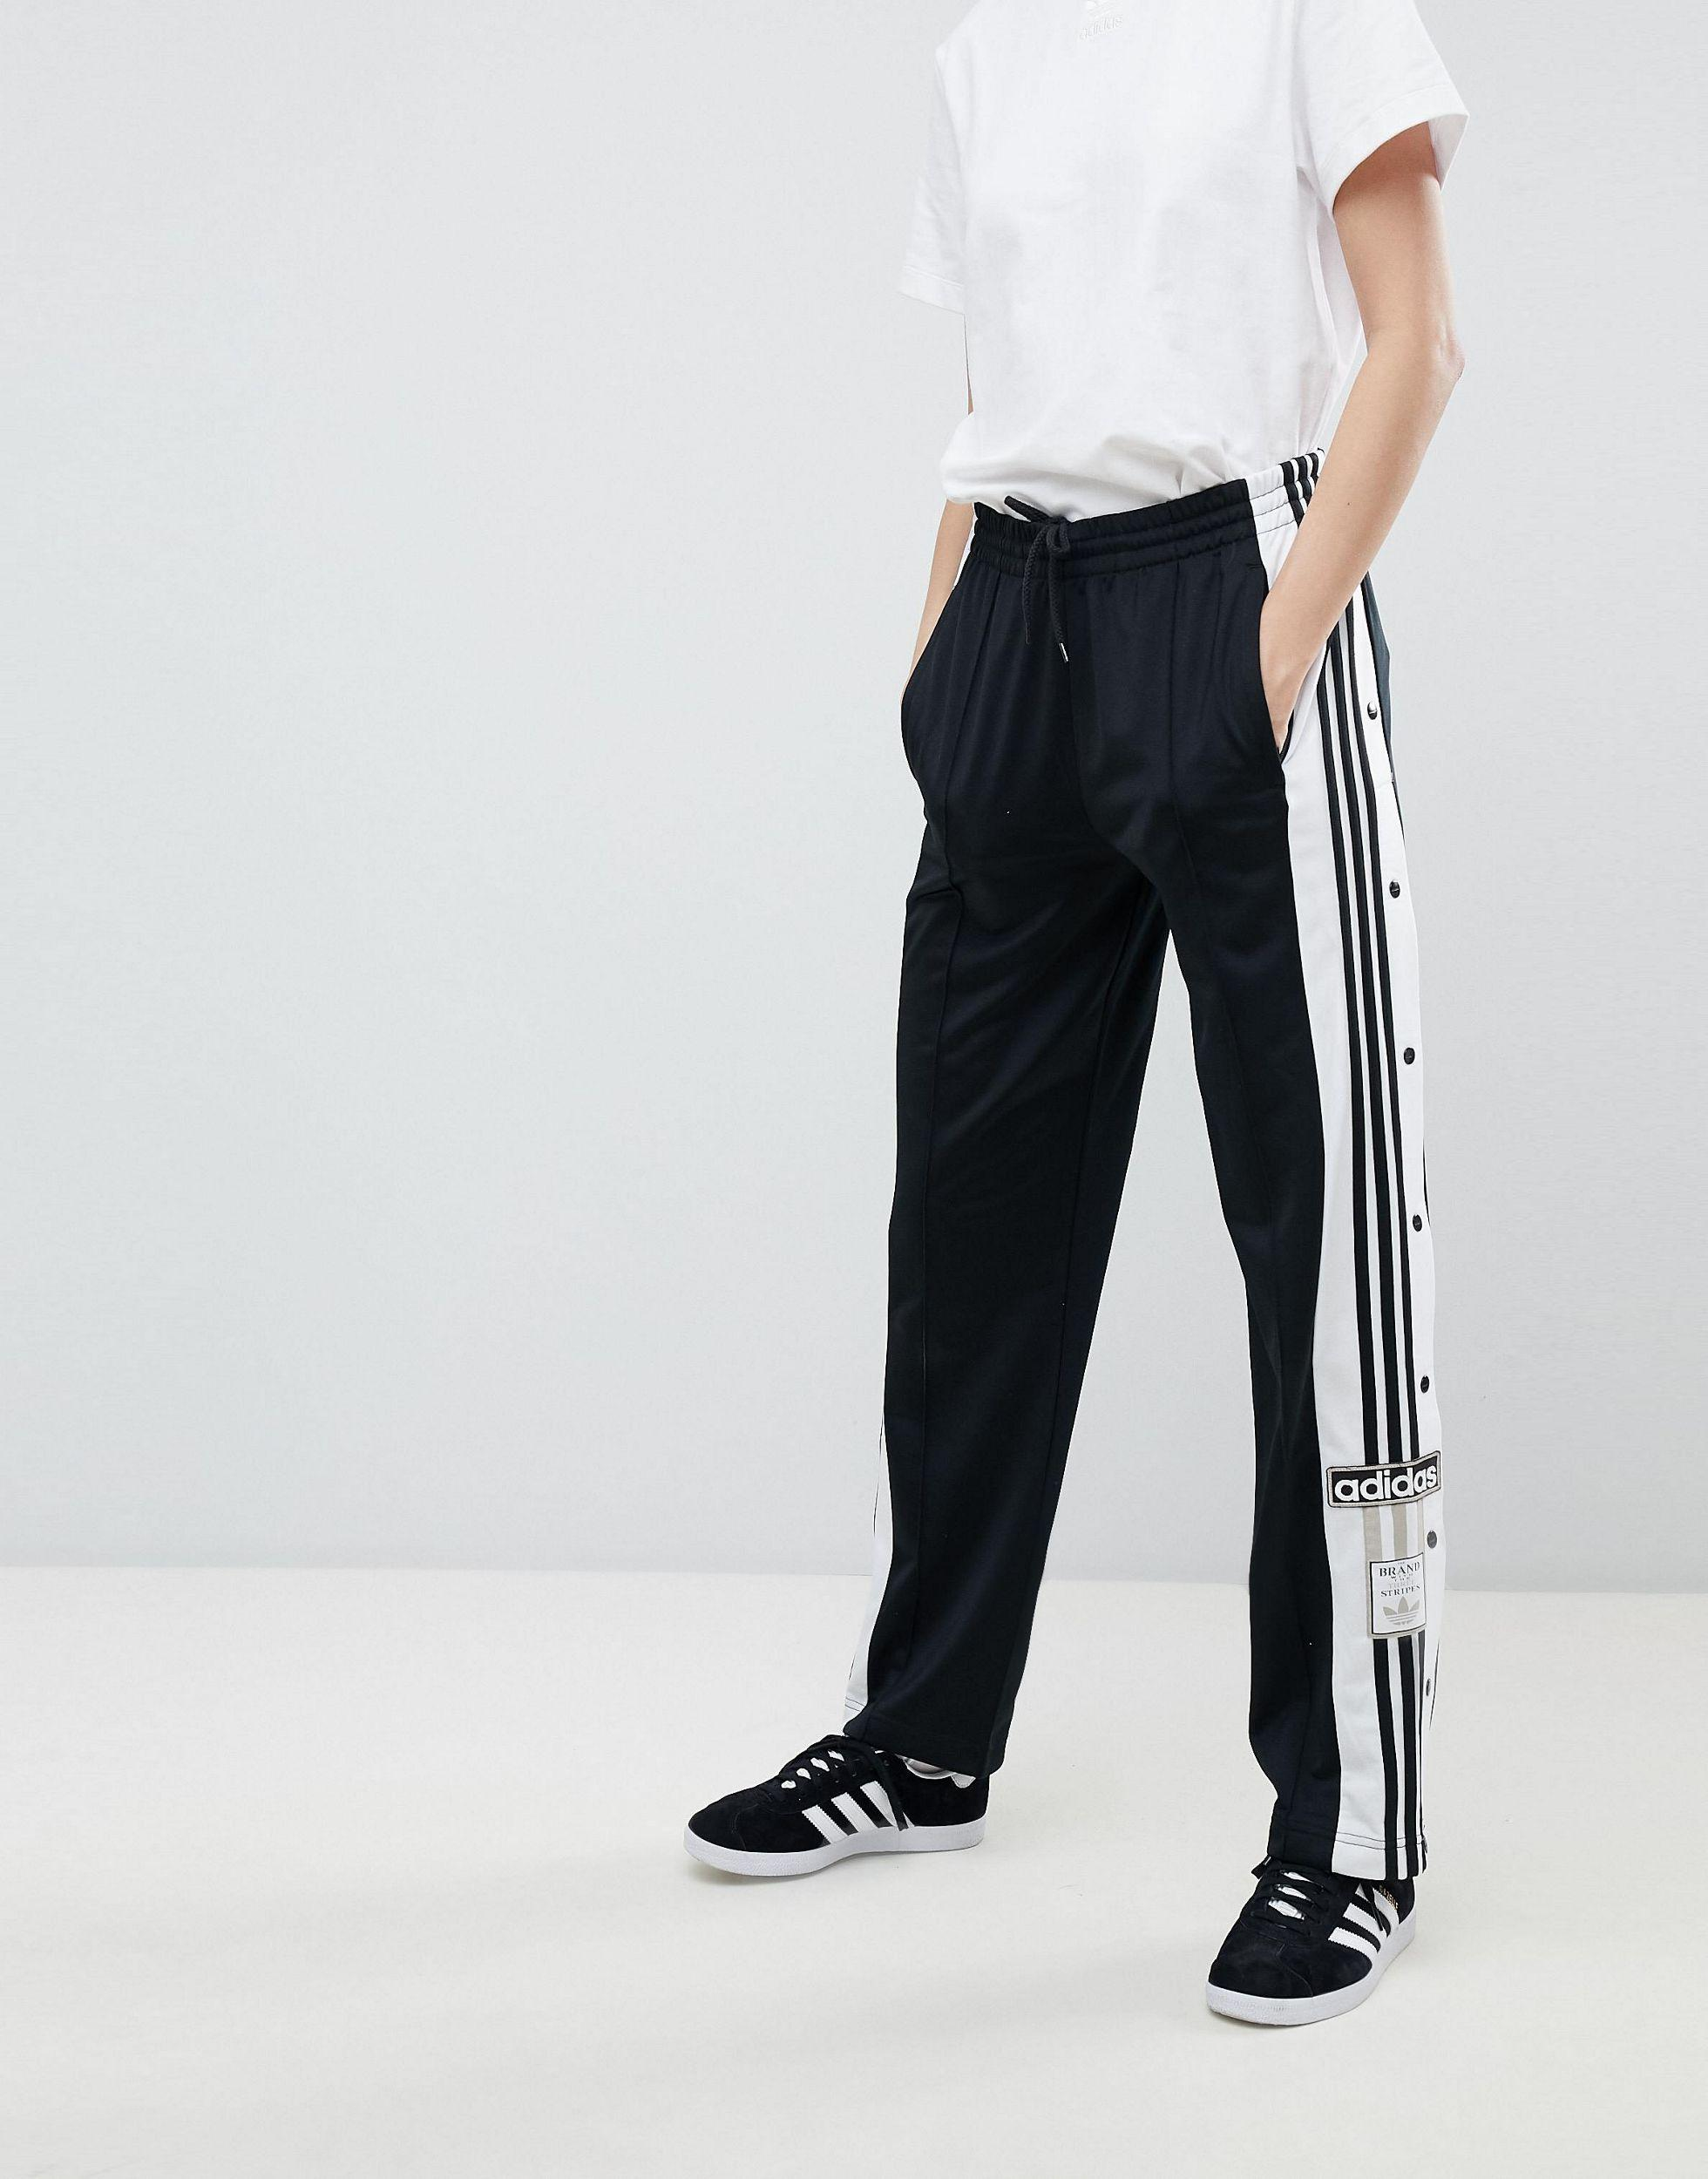 Originals Adicolor Popper Pants In Black